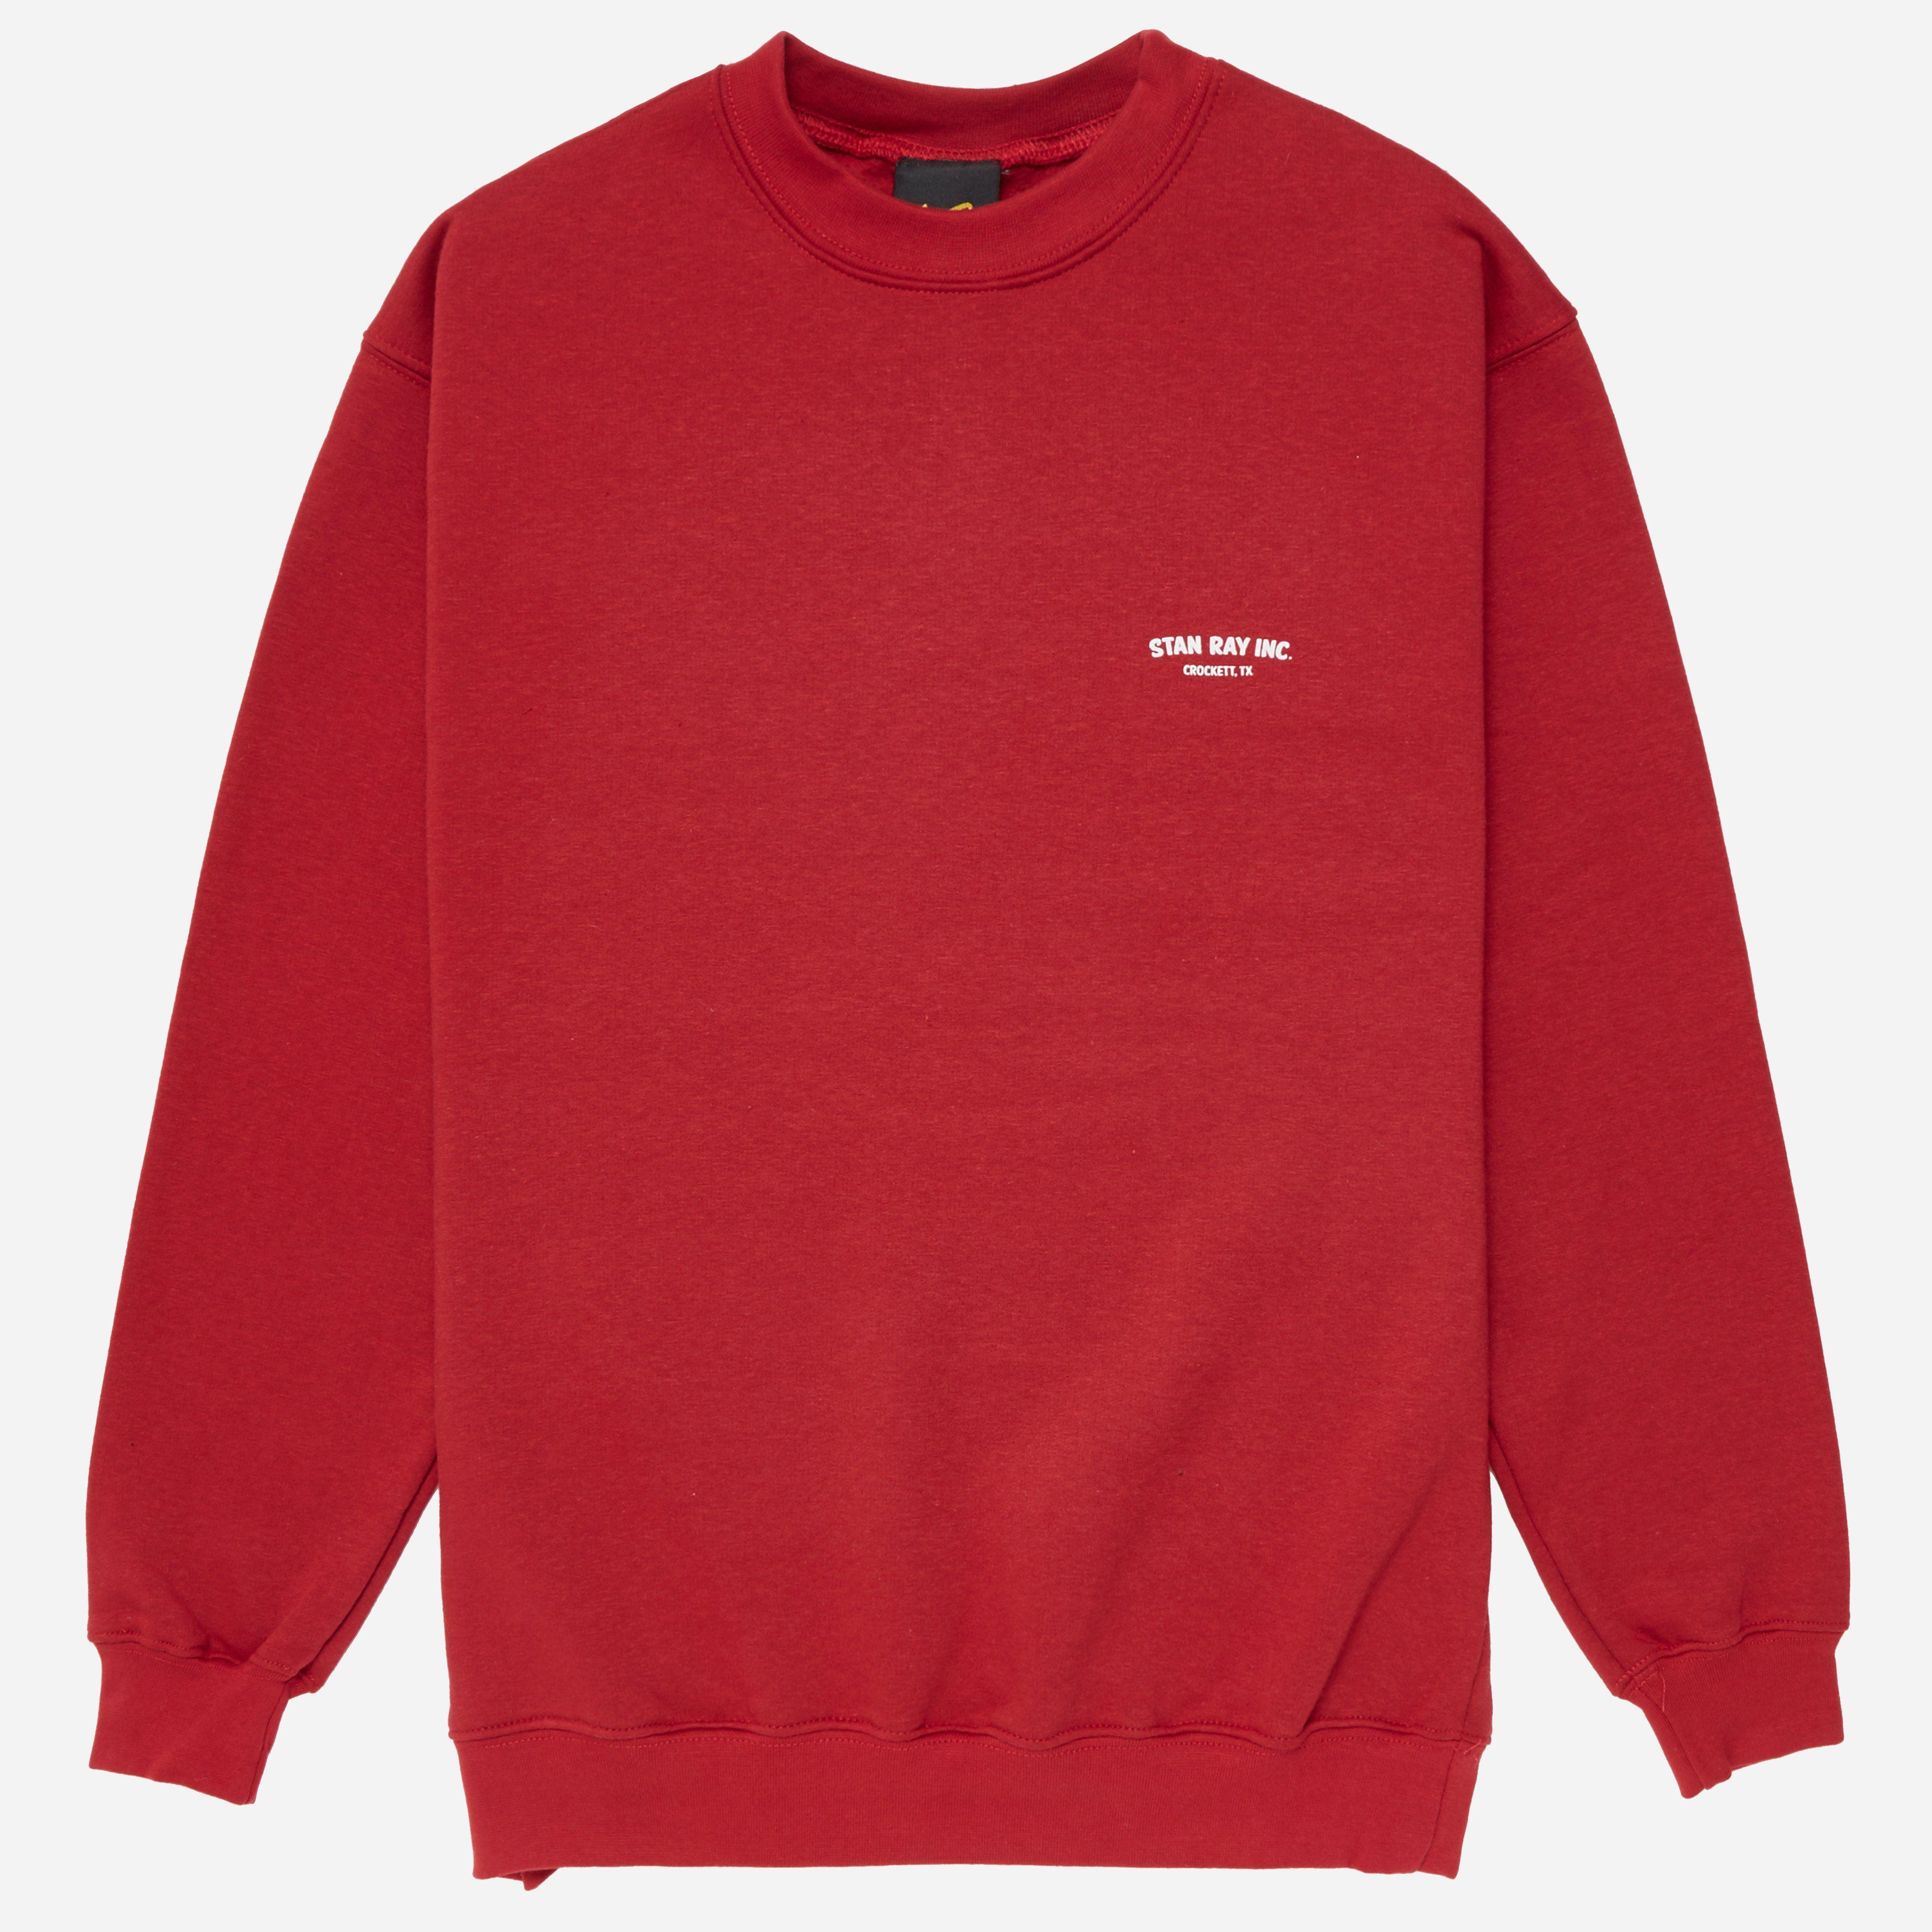 Stan Ray Inc. Sweatshirt